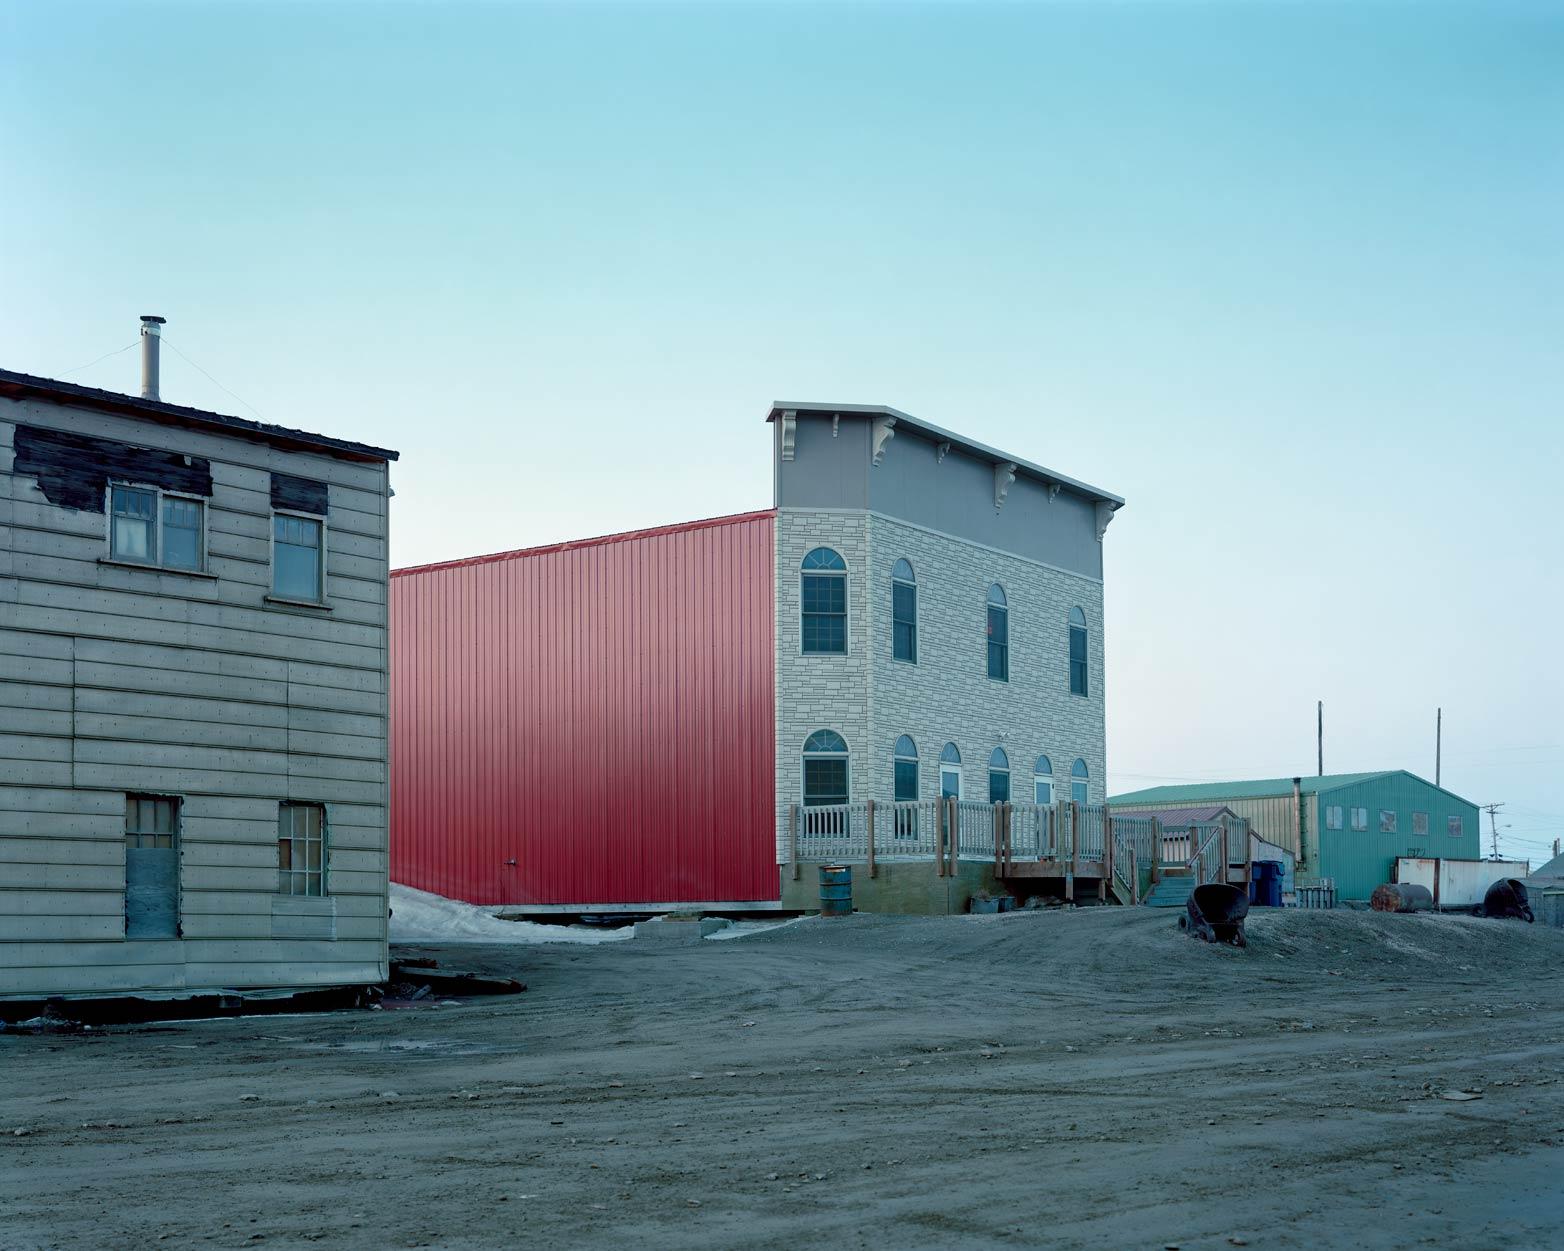 Main Street, Nome, Alaska, 2006